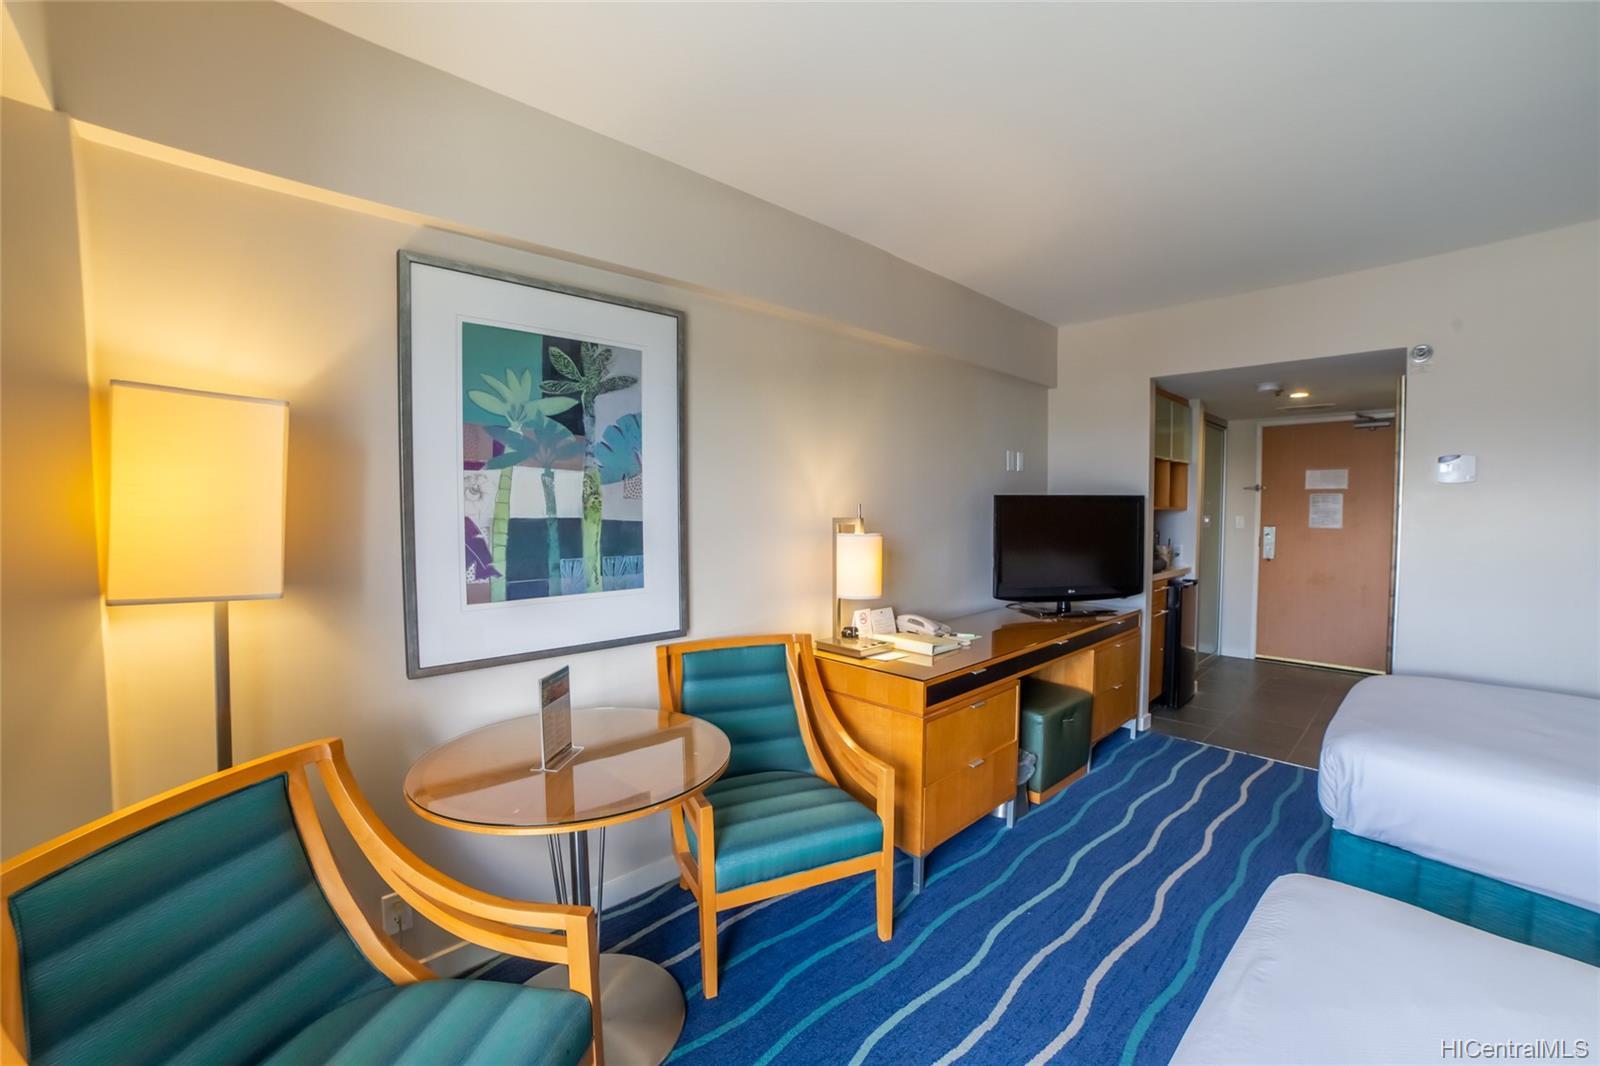 Ala Moana Hotel Condo condo # 929, Honolulu, Hawaii - photo 3 of 9